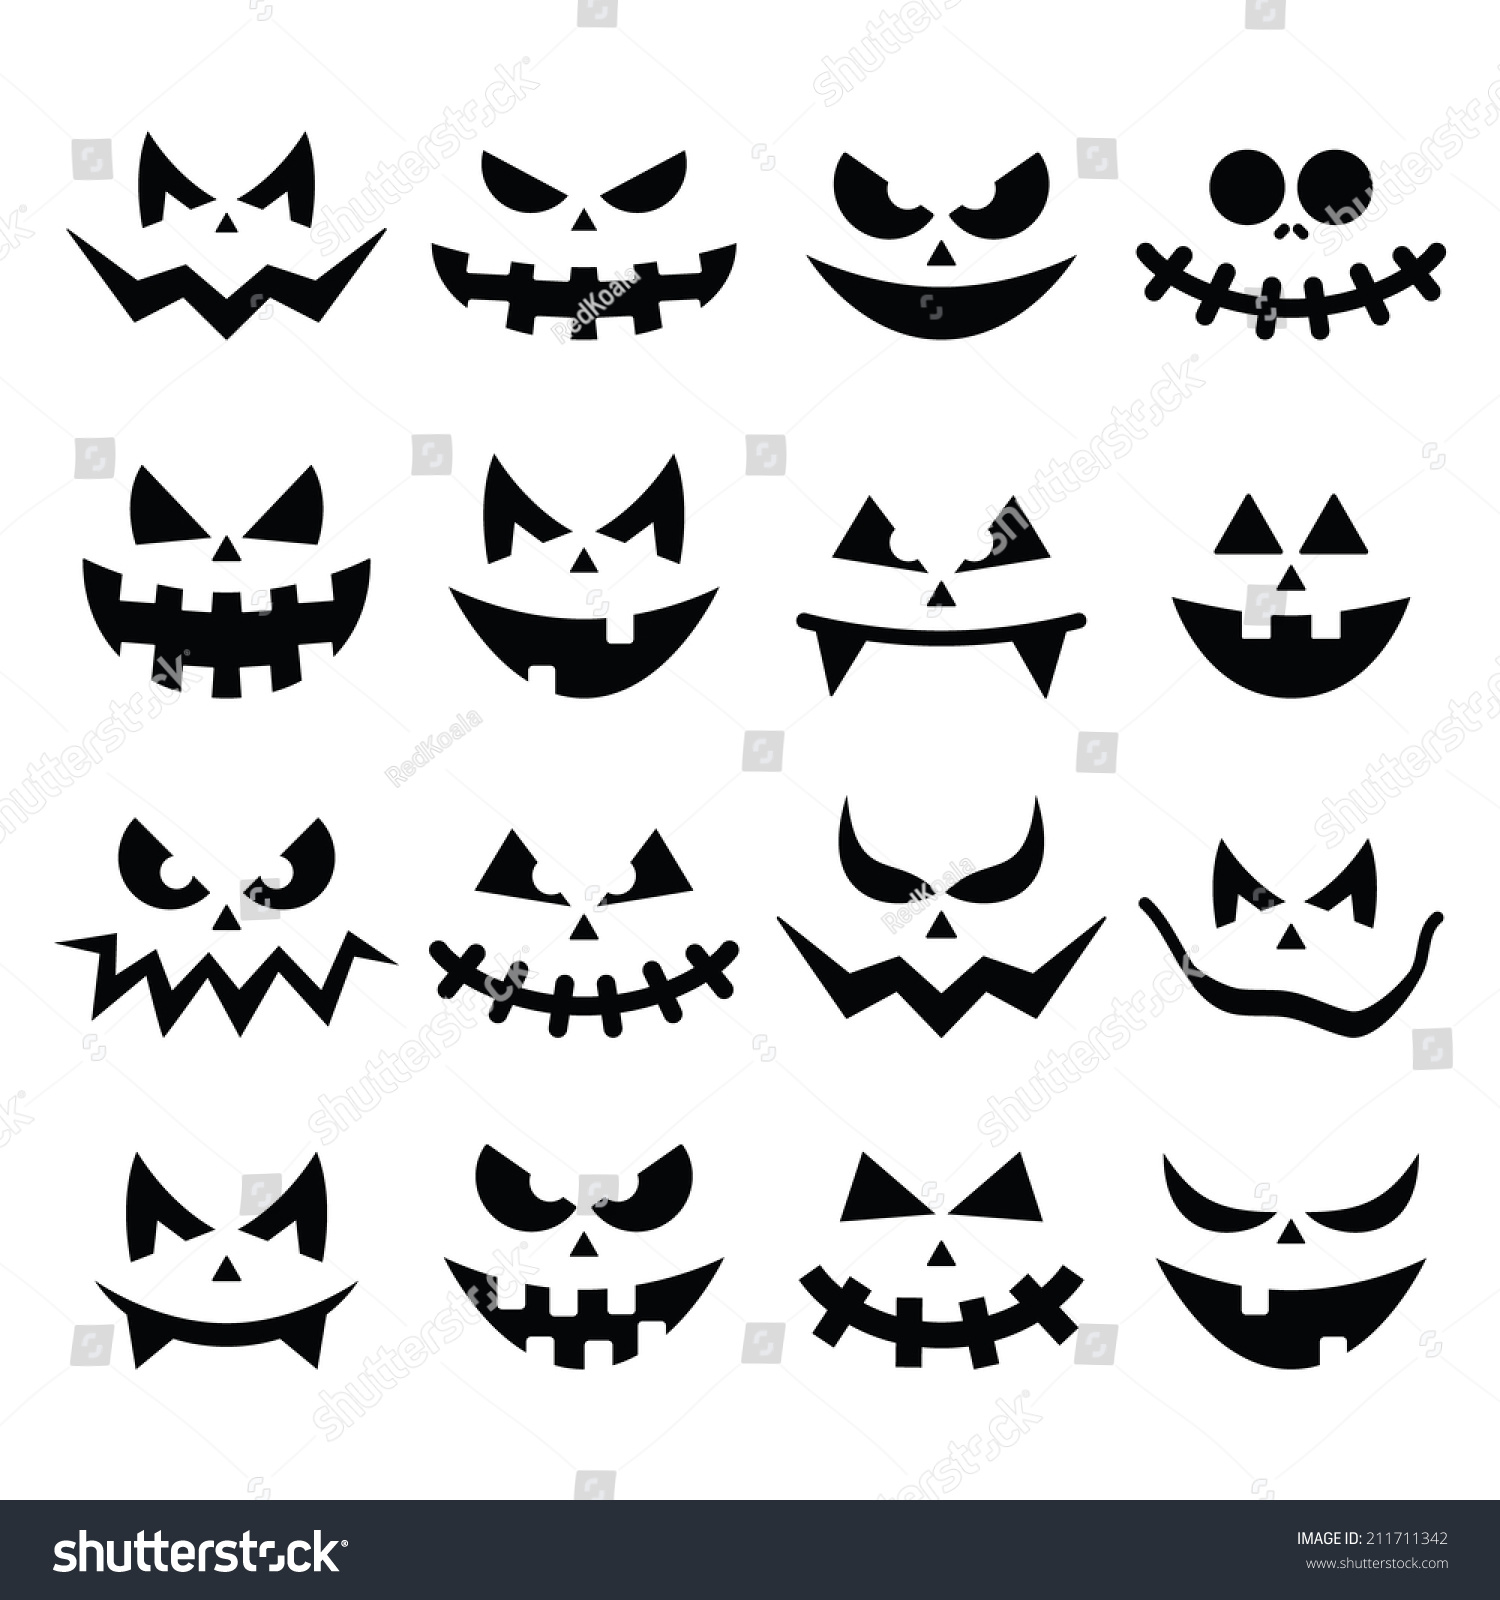 Scary Halloween Pumpkin Faces Icons Set Stock Vector